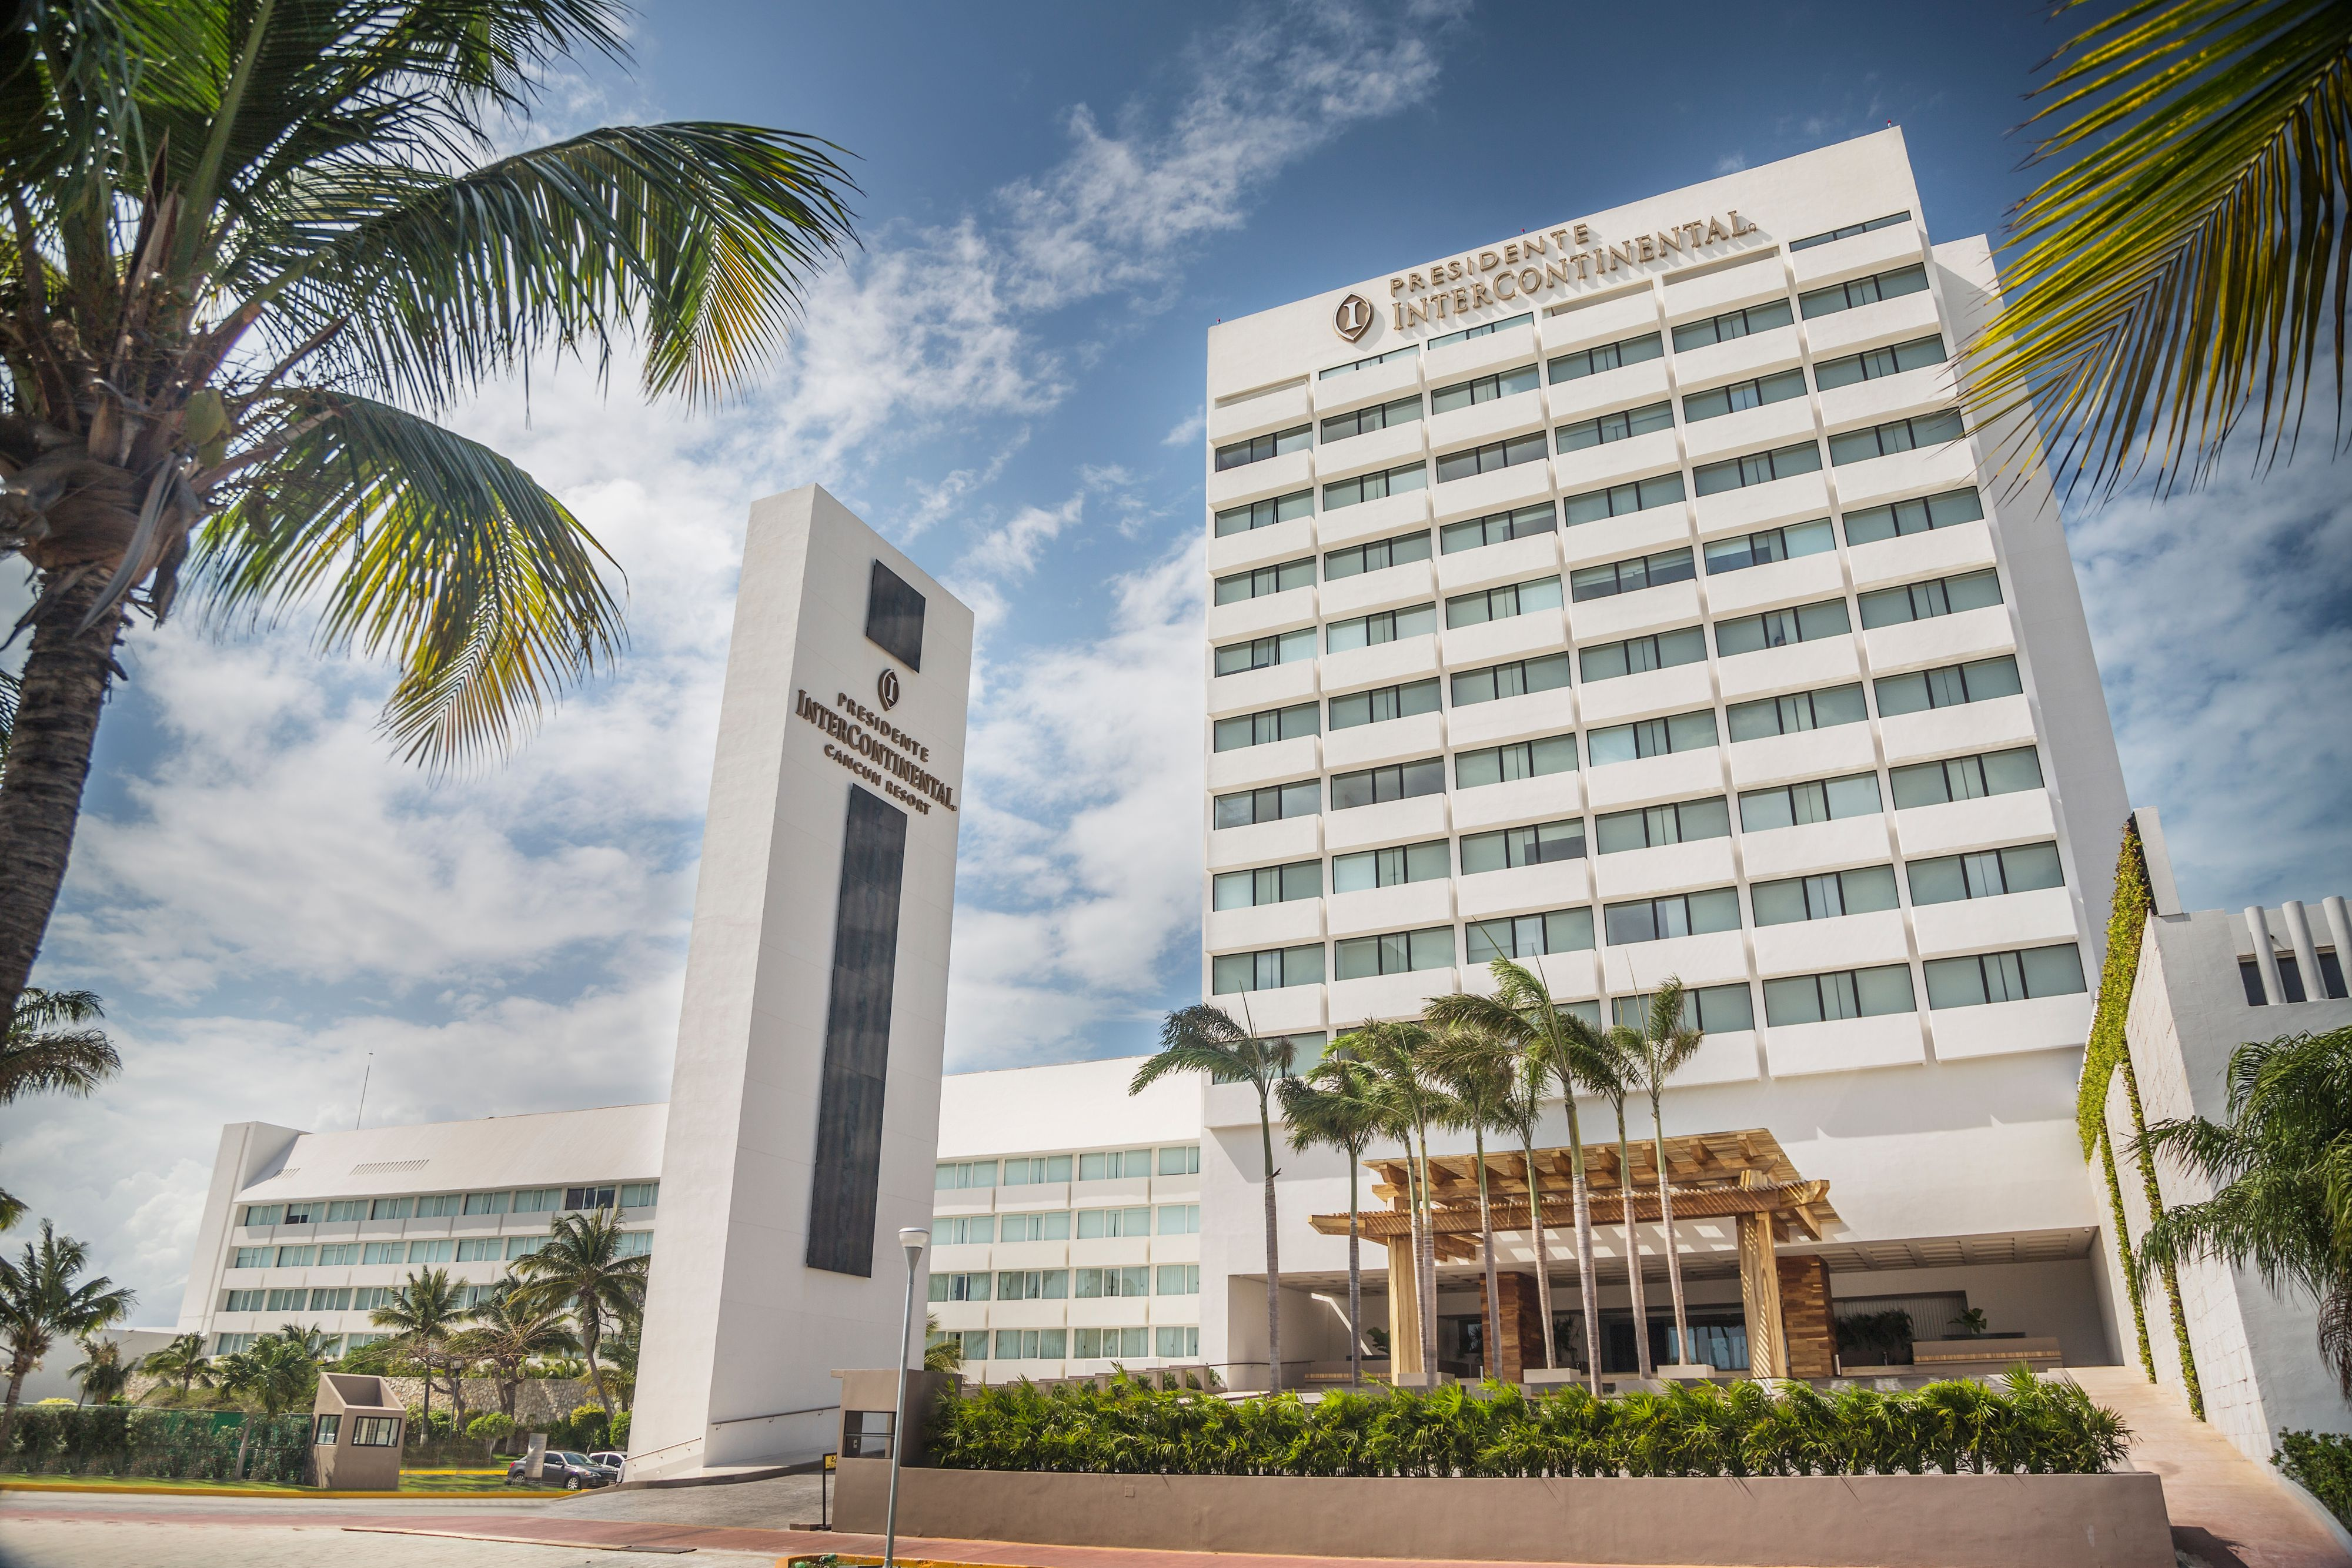 Foto de InterContinental Presidente Cancun Resort Cancún